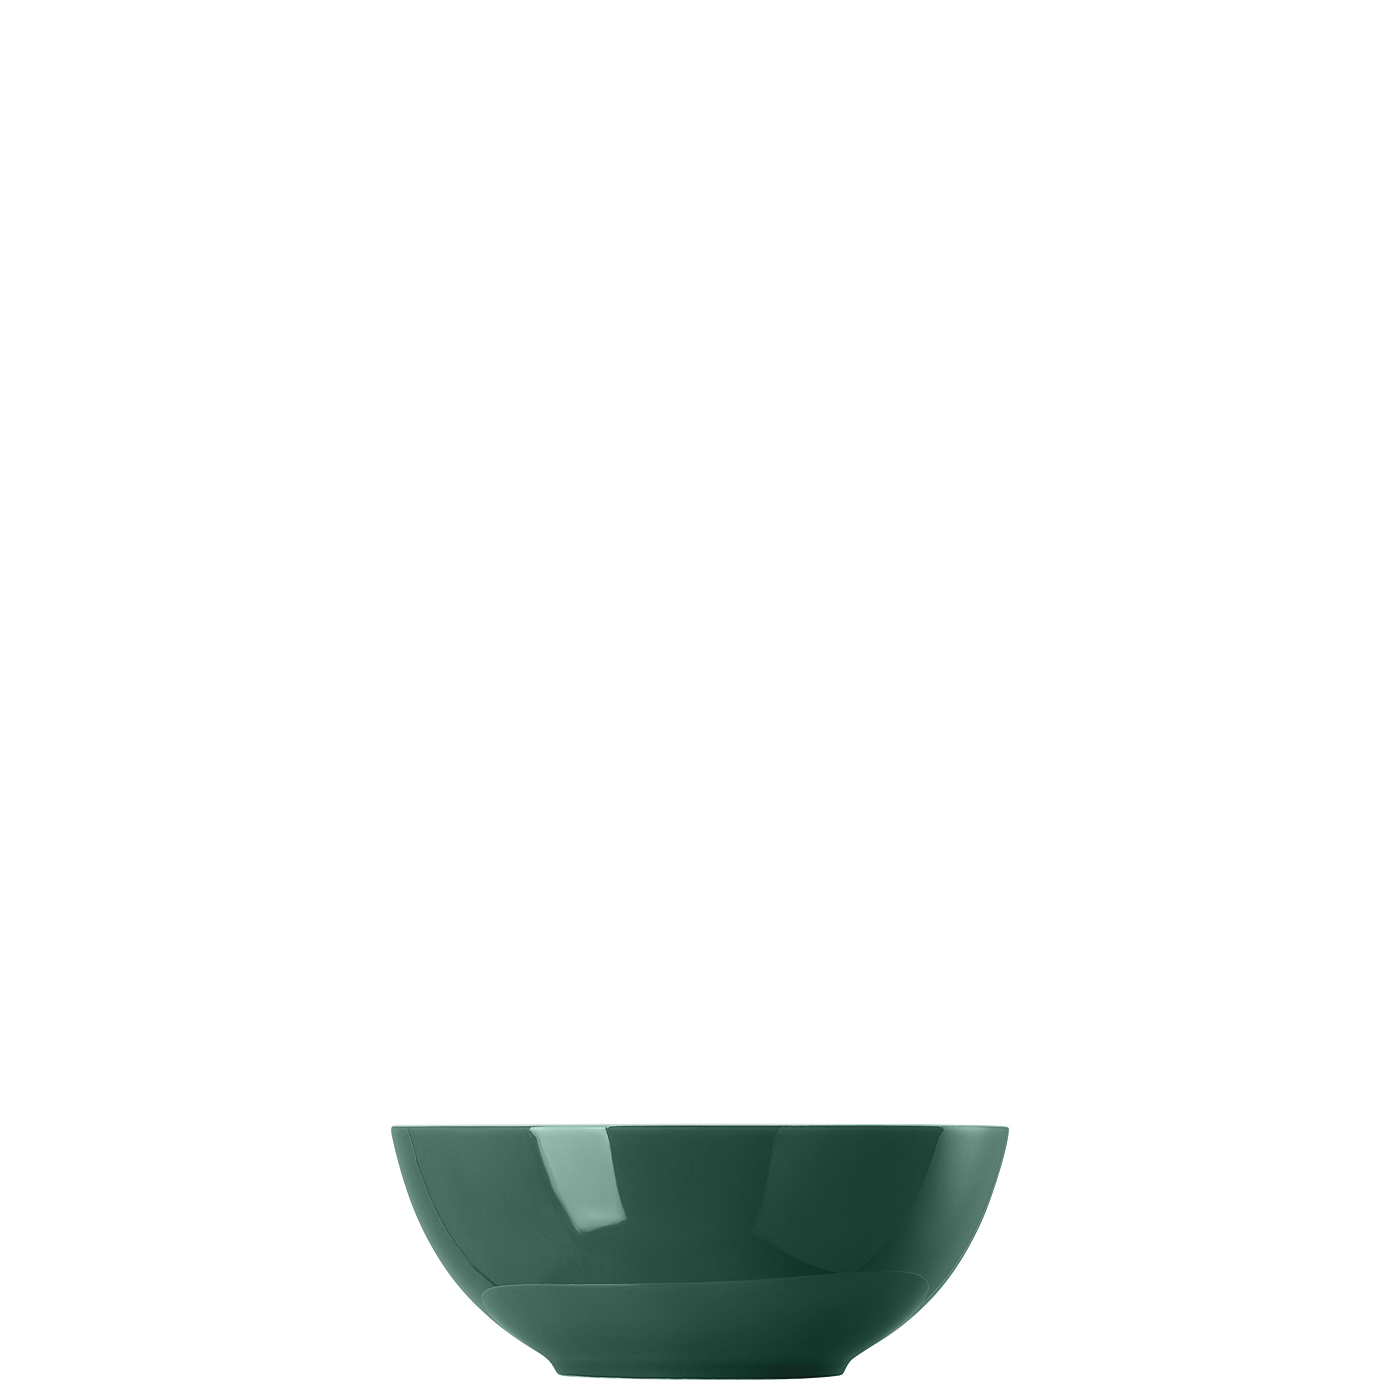 Müslischale 15 cm Sunny Day Herbal Green Thomas Porzellan